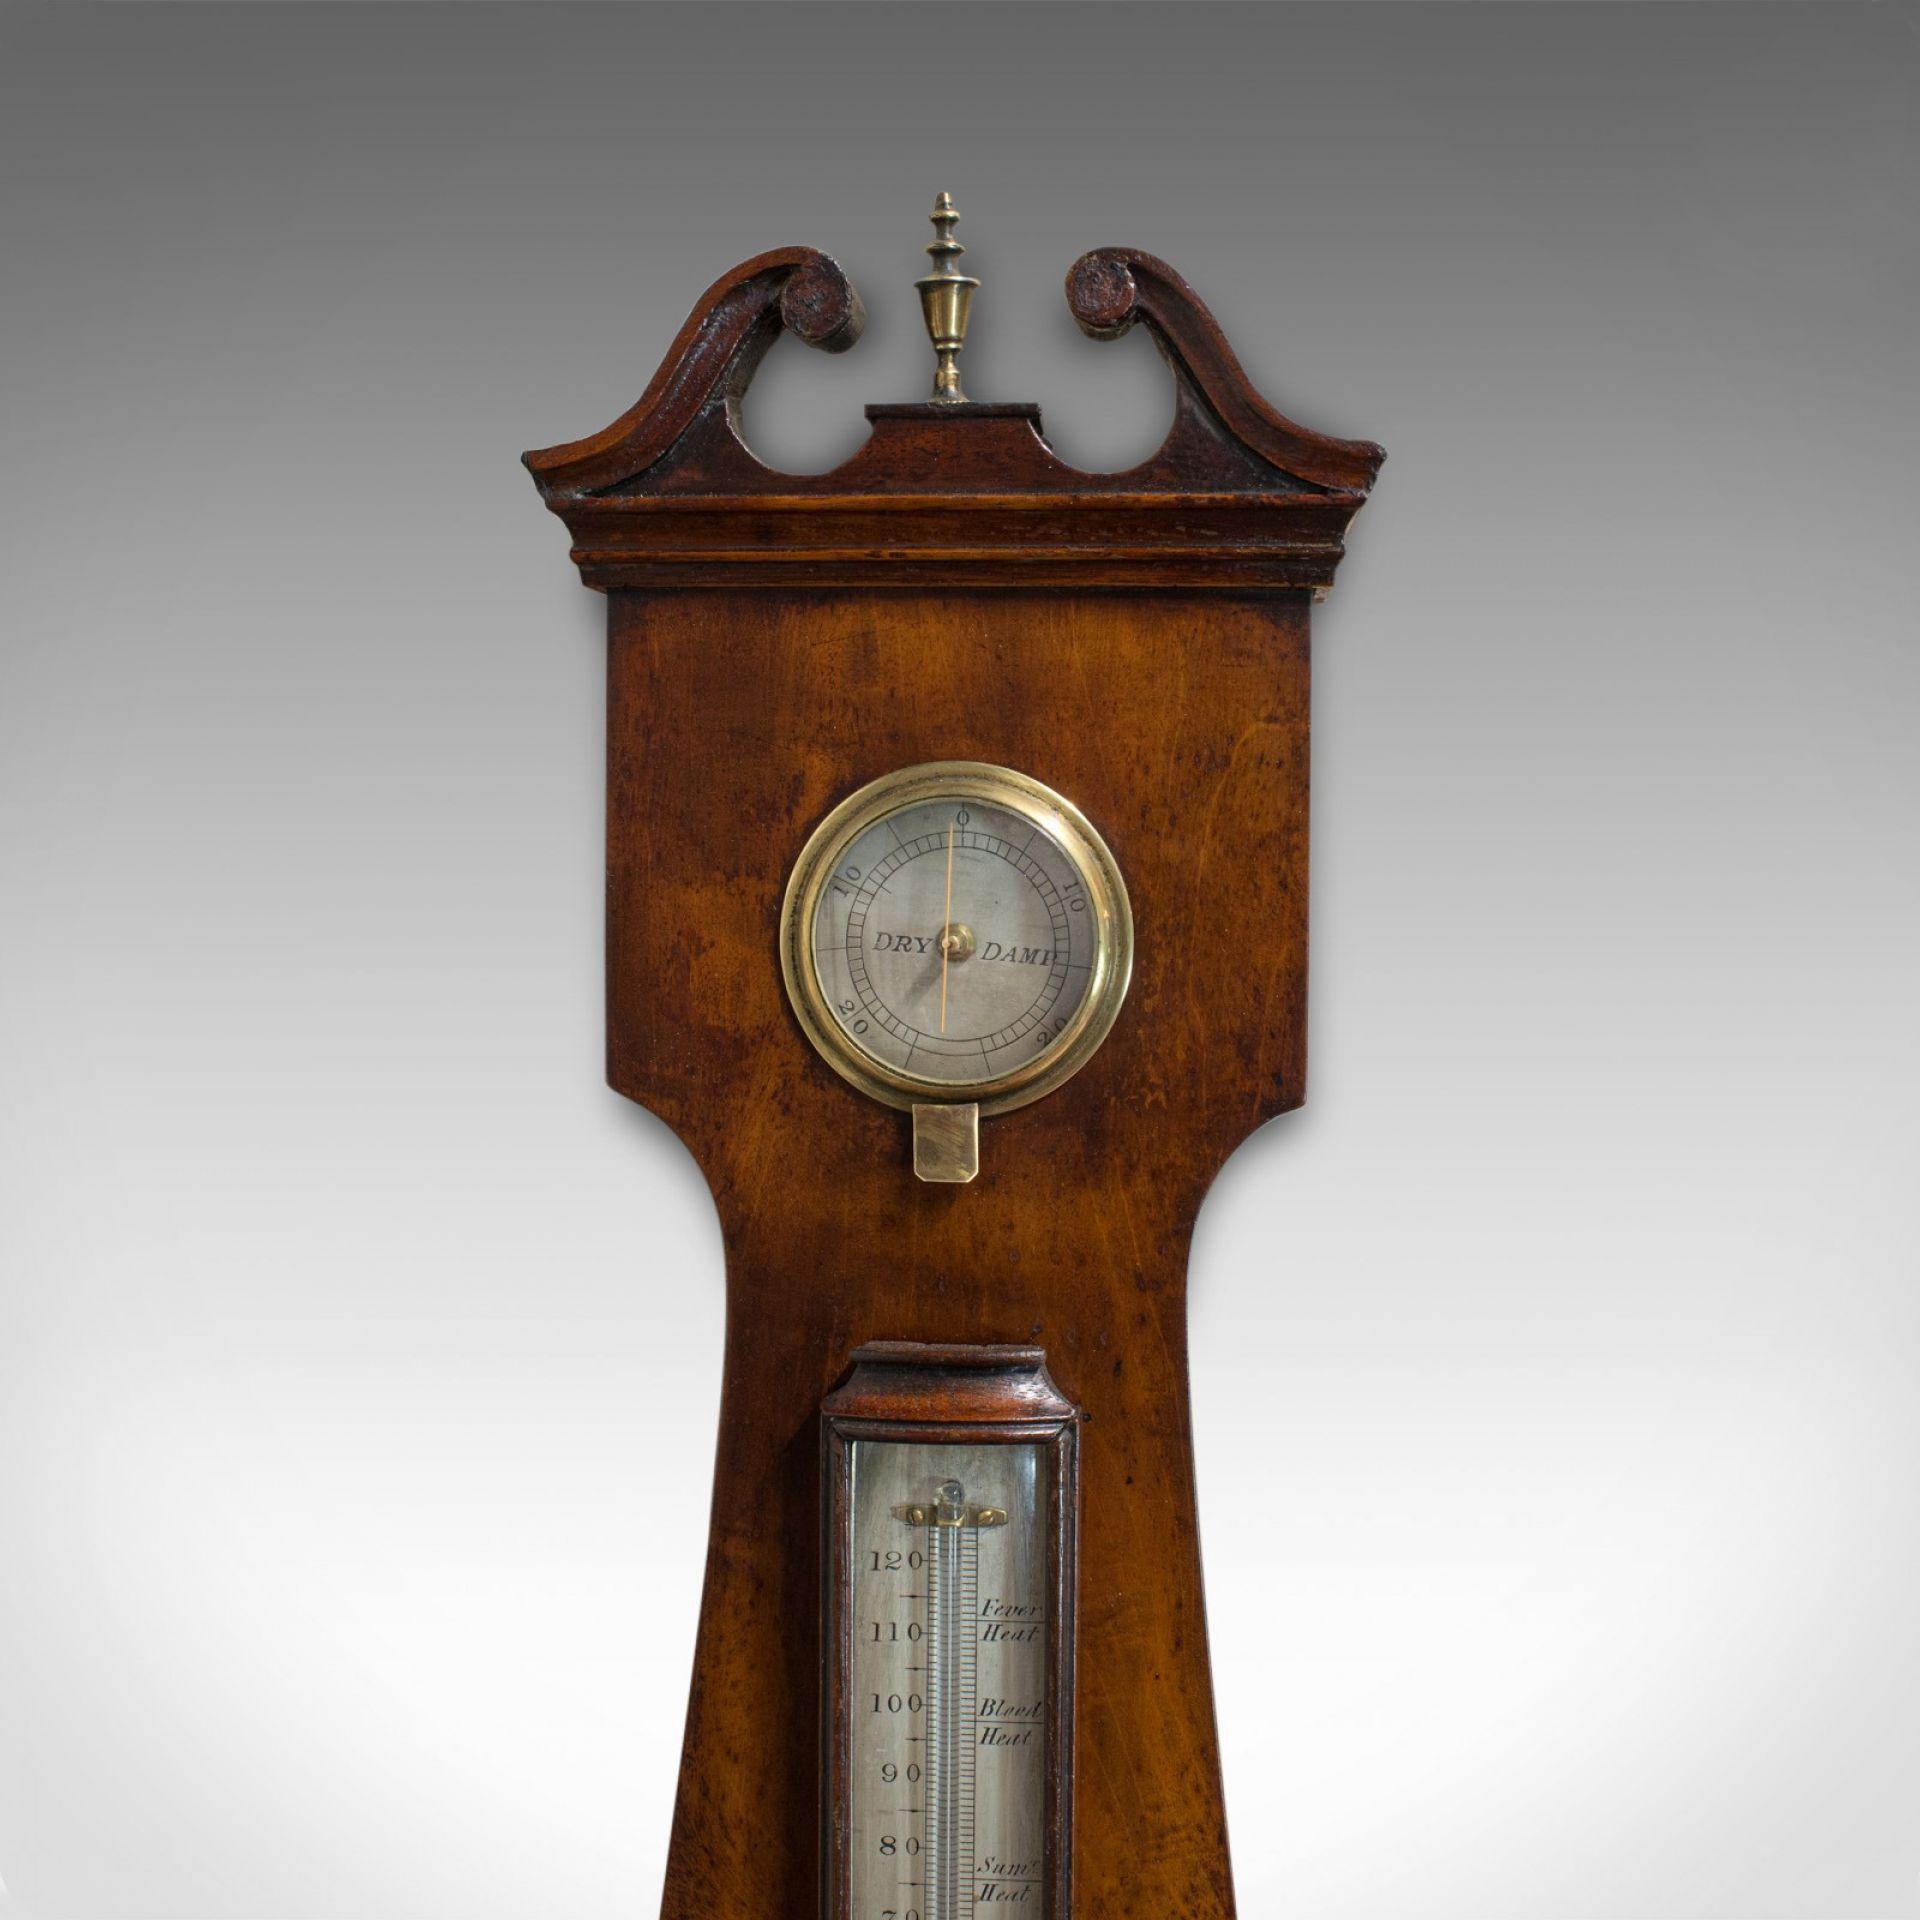 Antique Banjo Barometer, English, Mahogany, John Sowter, Oxford, Victorian